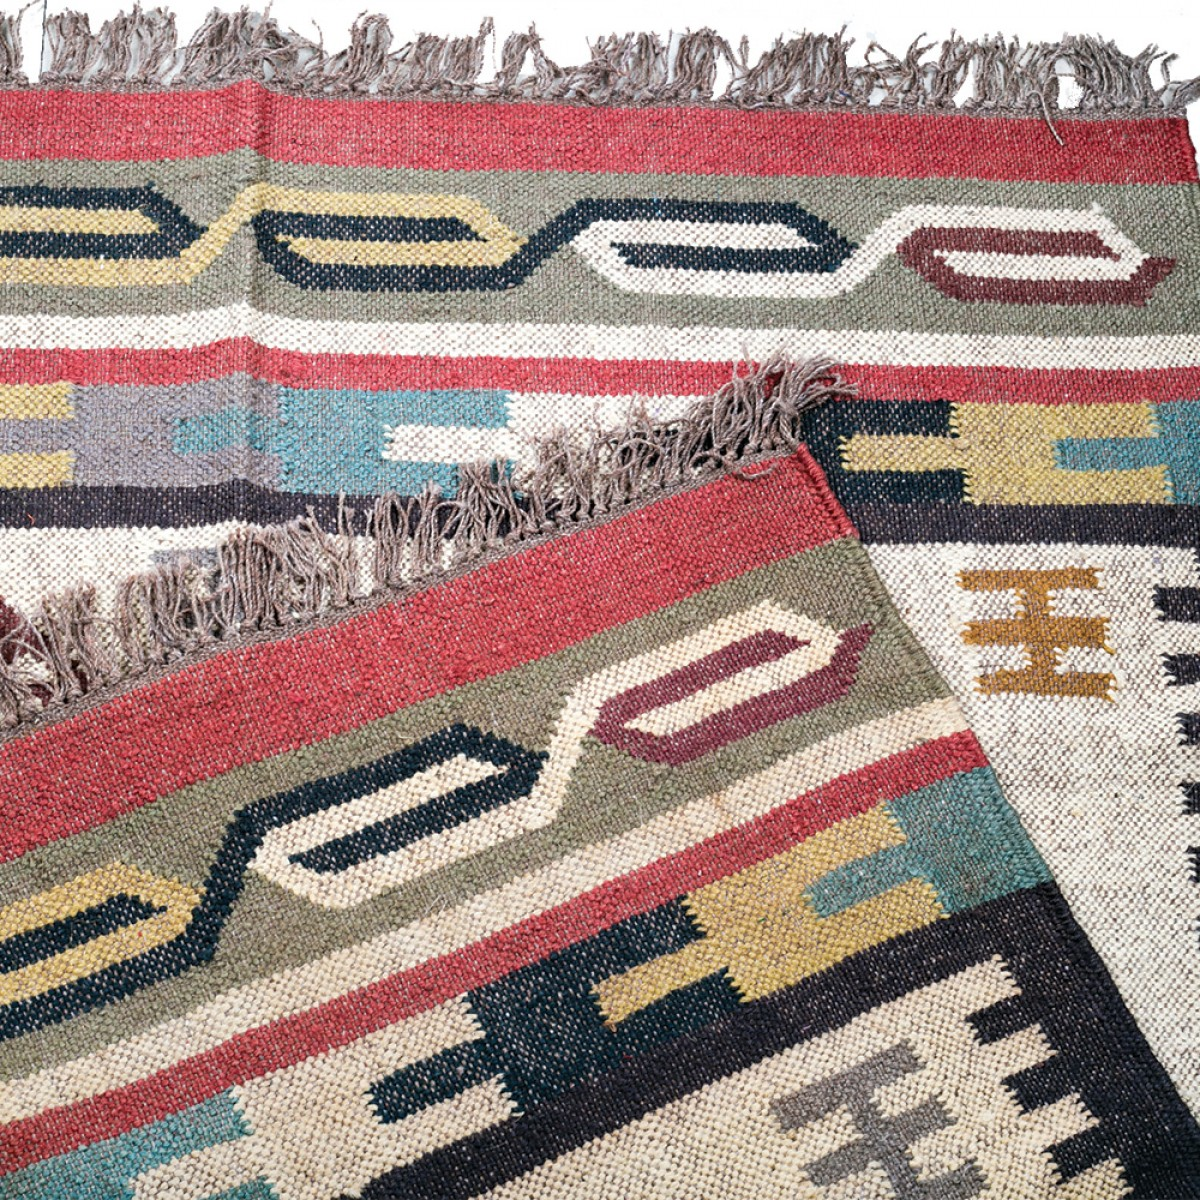 Jute Kilim Floor Rugs - Natural Multi Color